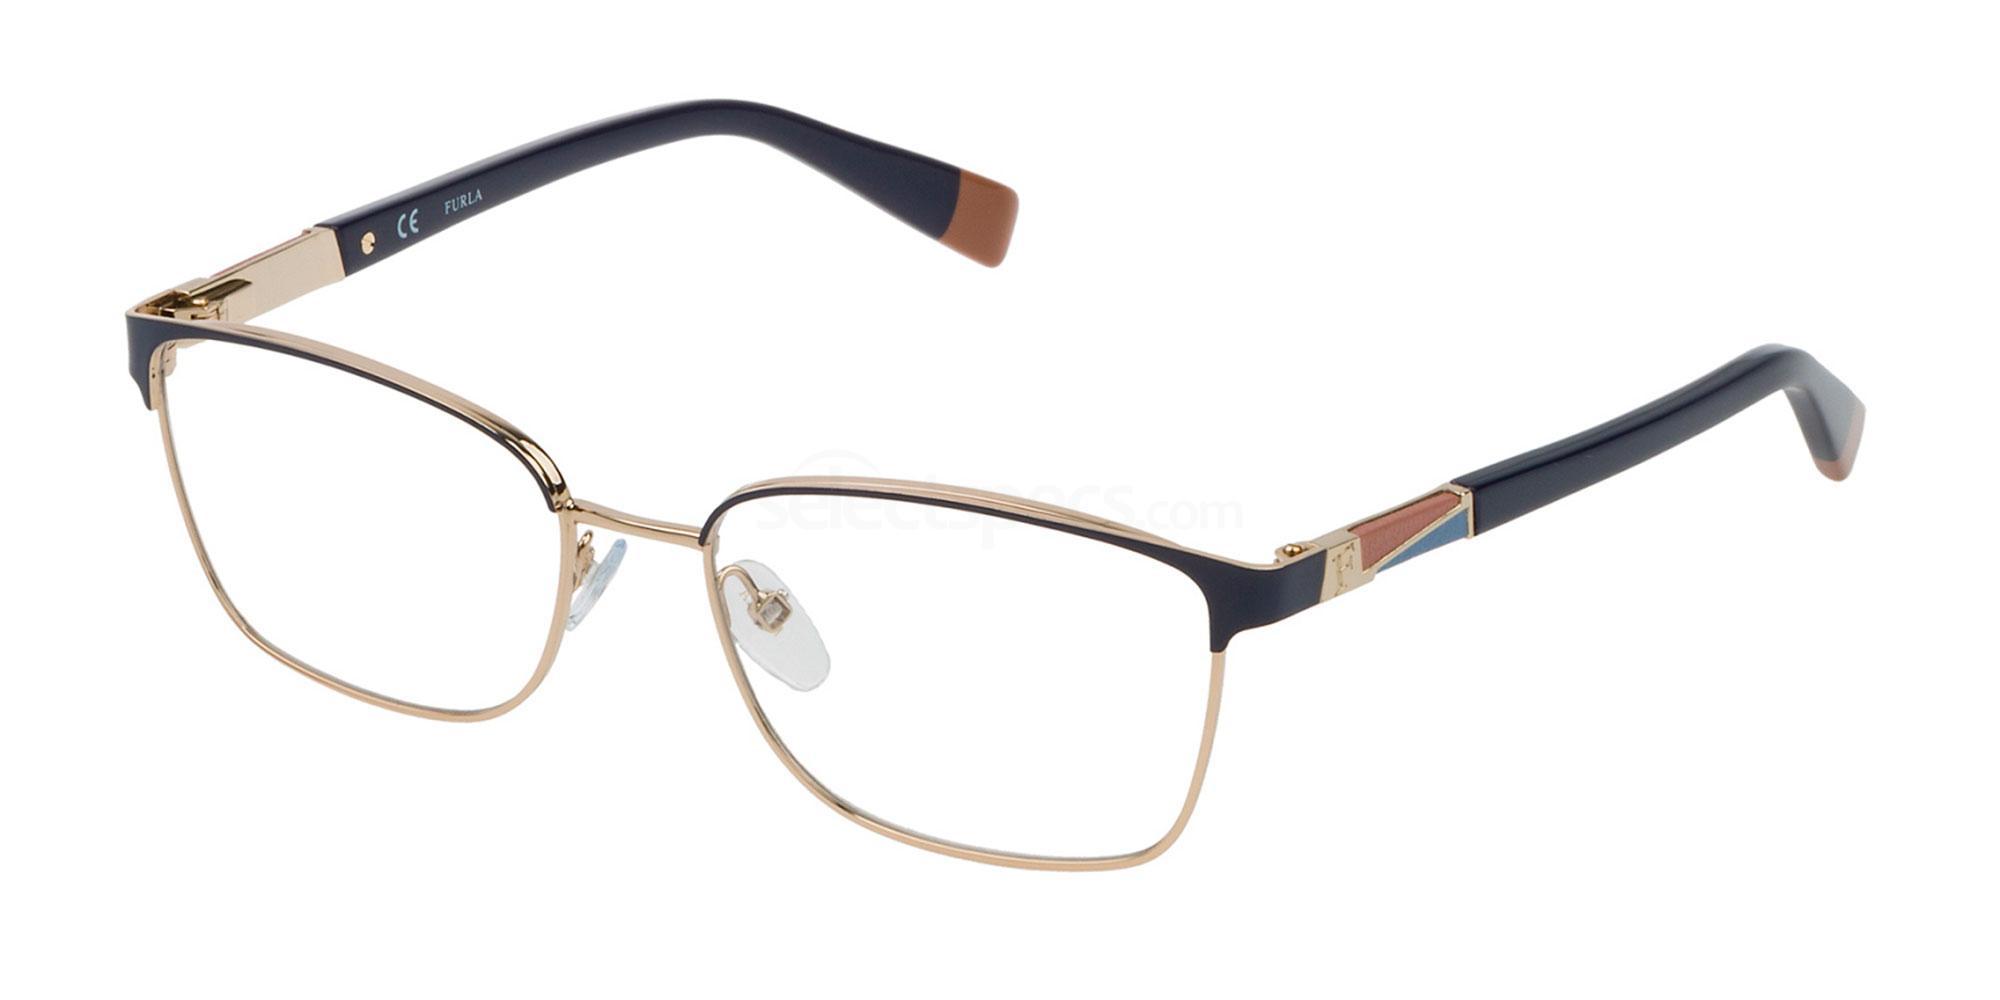 0492 VFU191 Glasses, Furla